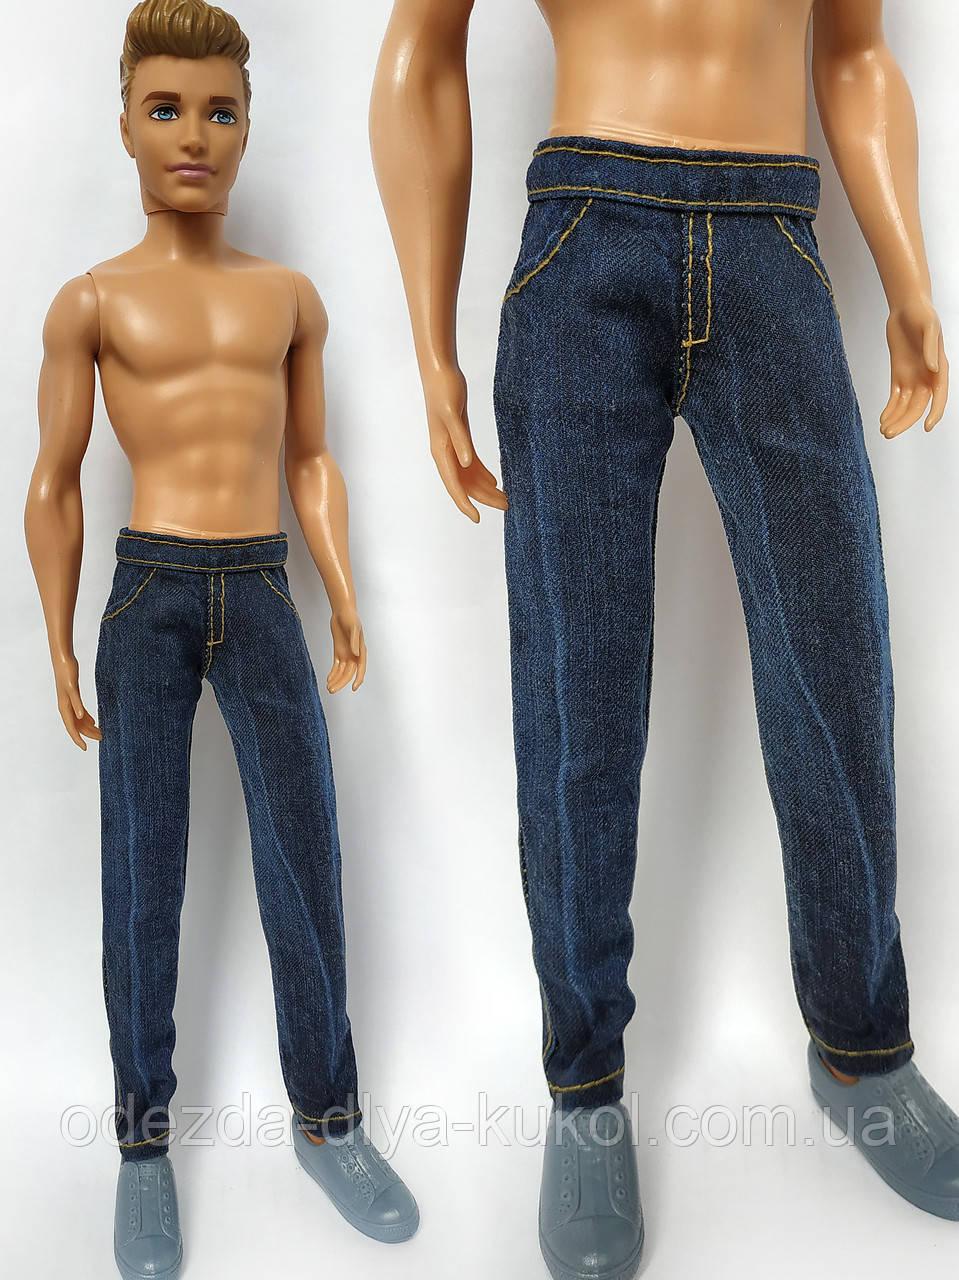 Одяг для Кена - джинси